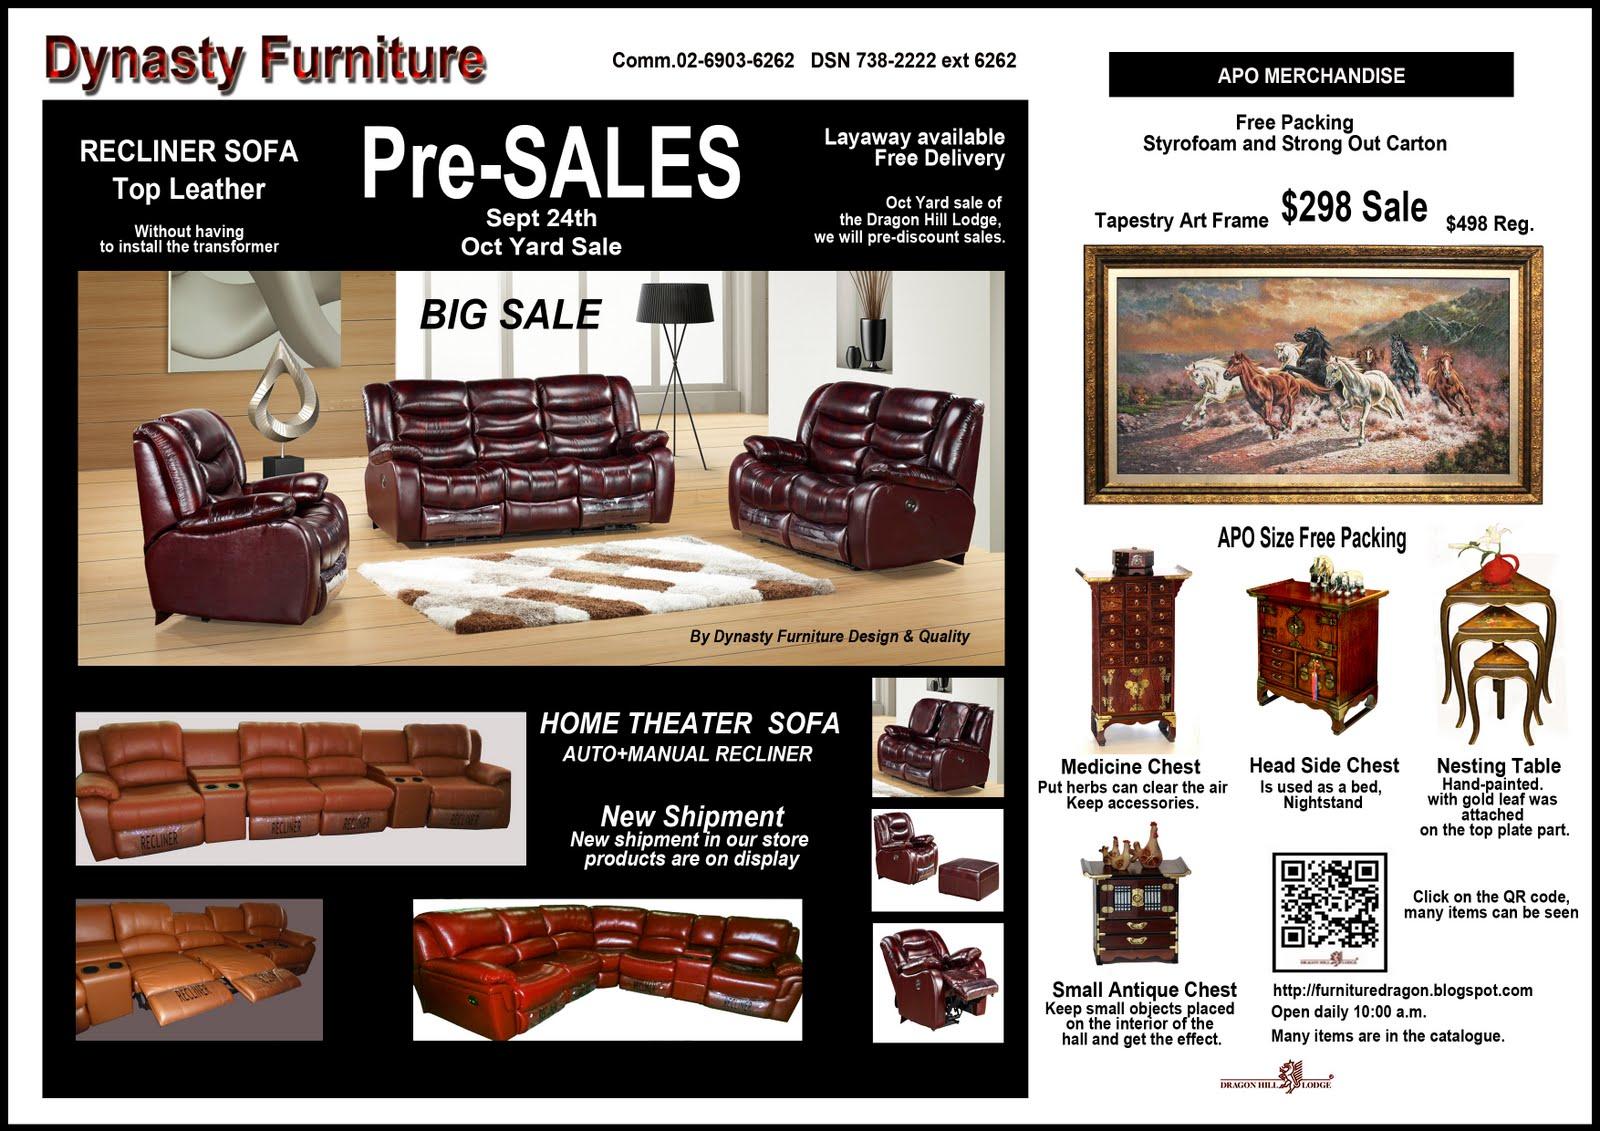 Dynasty Furniture Korea 08 26 11